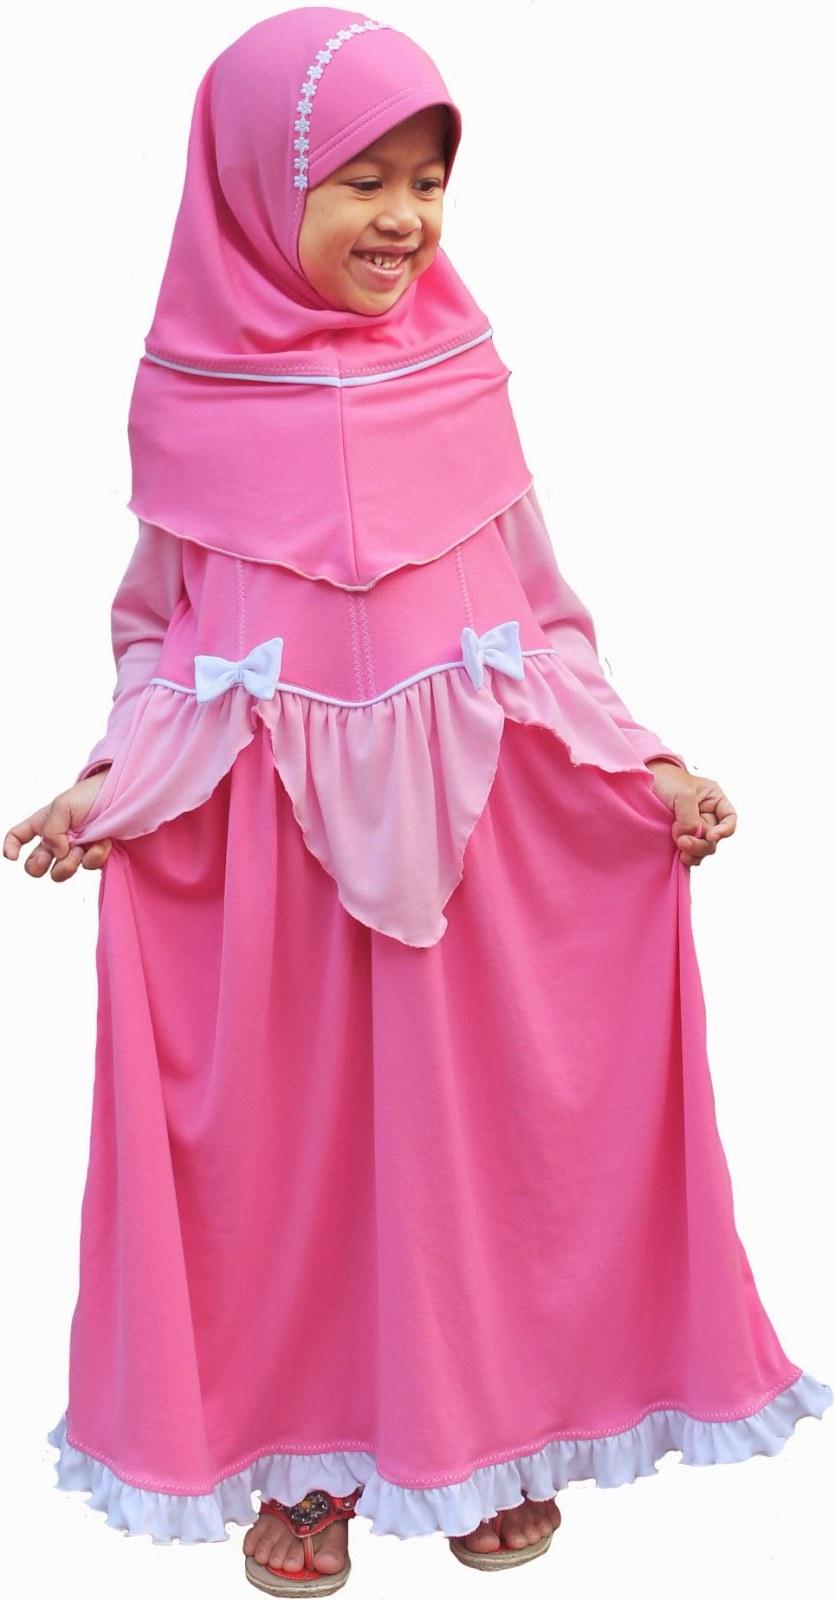 Bentuk Model Baju Lebaran Untuk Anak Perempuan T8dj Model Baju Muslim Anak Perempuan